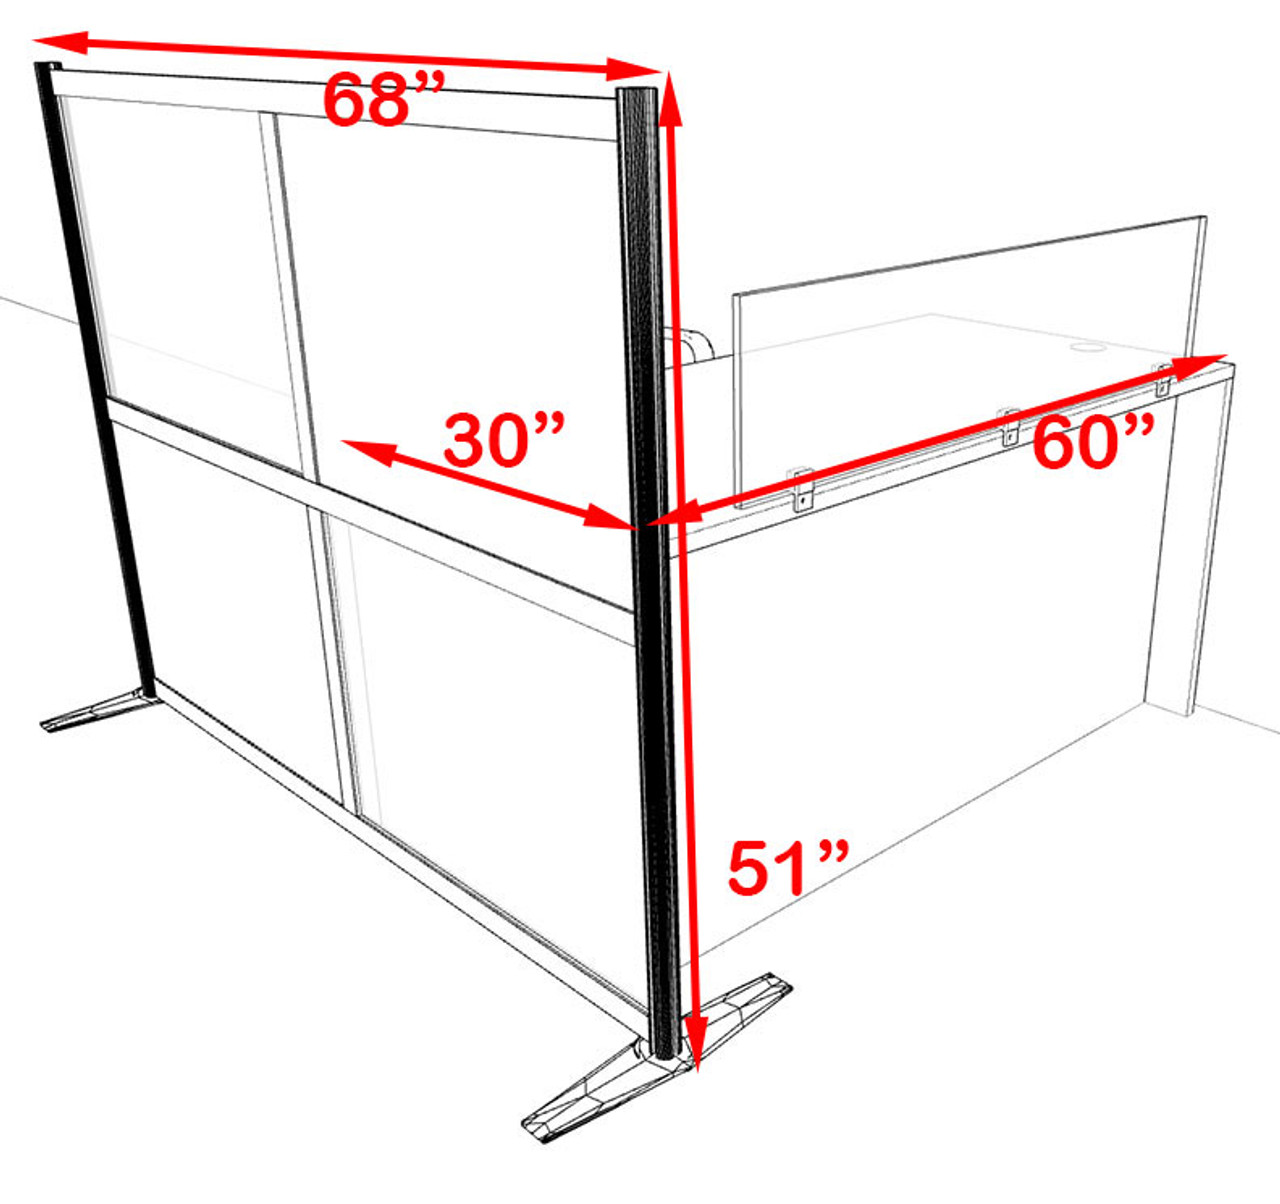 One Person Workstation w/Acrylic Aluminum Privacy Panel, #OT-SUL-HPB40